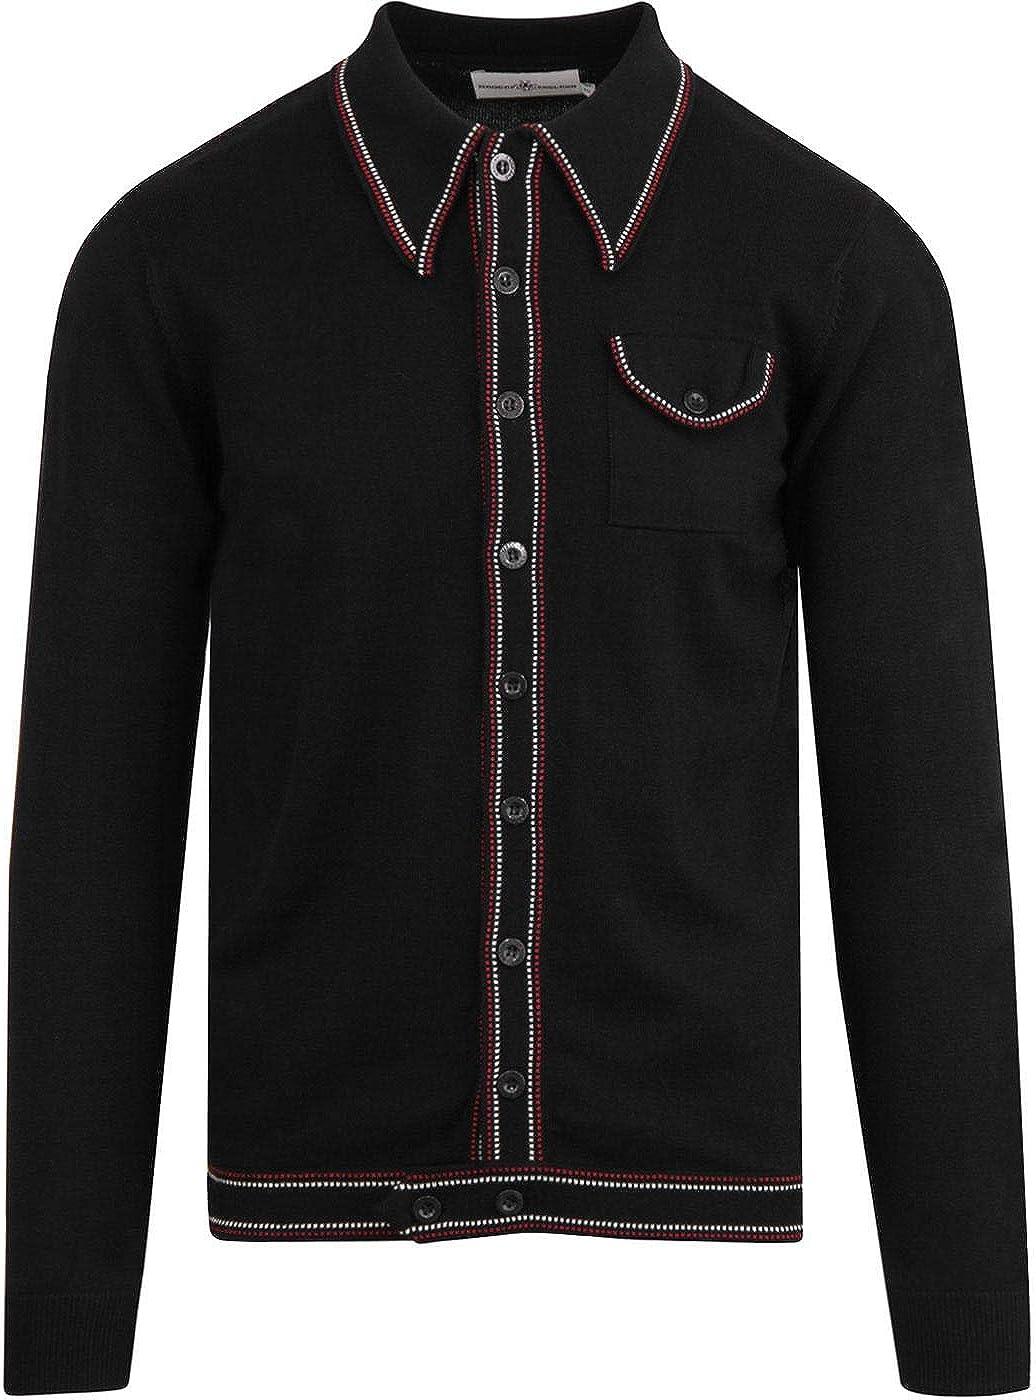 1960s Mens Shirts | 60s Mod Shirts, Hippie Shirts Madcap England Mens Long Sleeve Crawdaddy Polo Cardigan in Black £39.99 AT vintagedancer.com